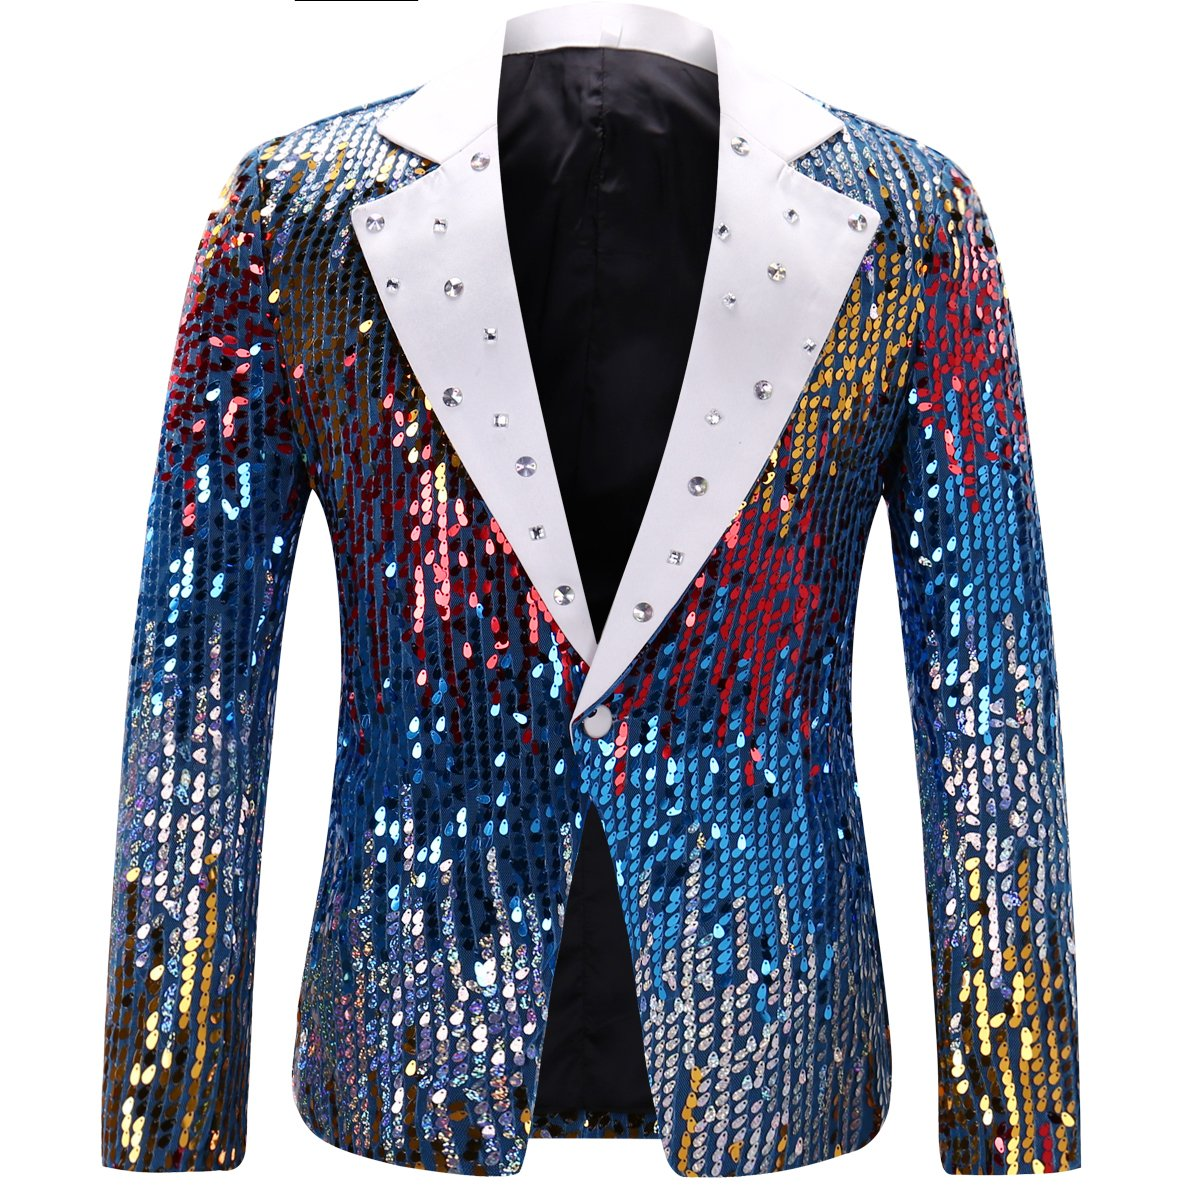 Men's Slim Fit Suit Jacket Casual One Button Shiny Sequin Party Wedding Blazer